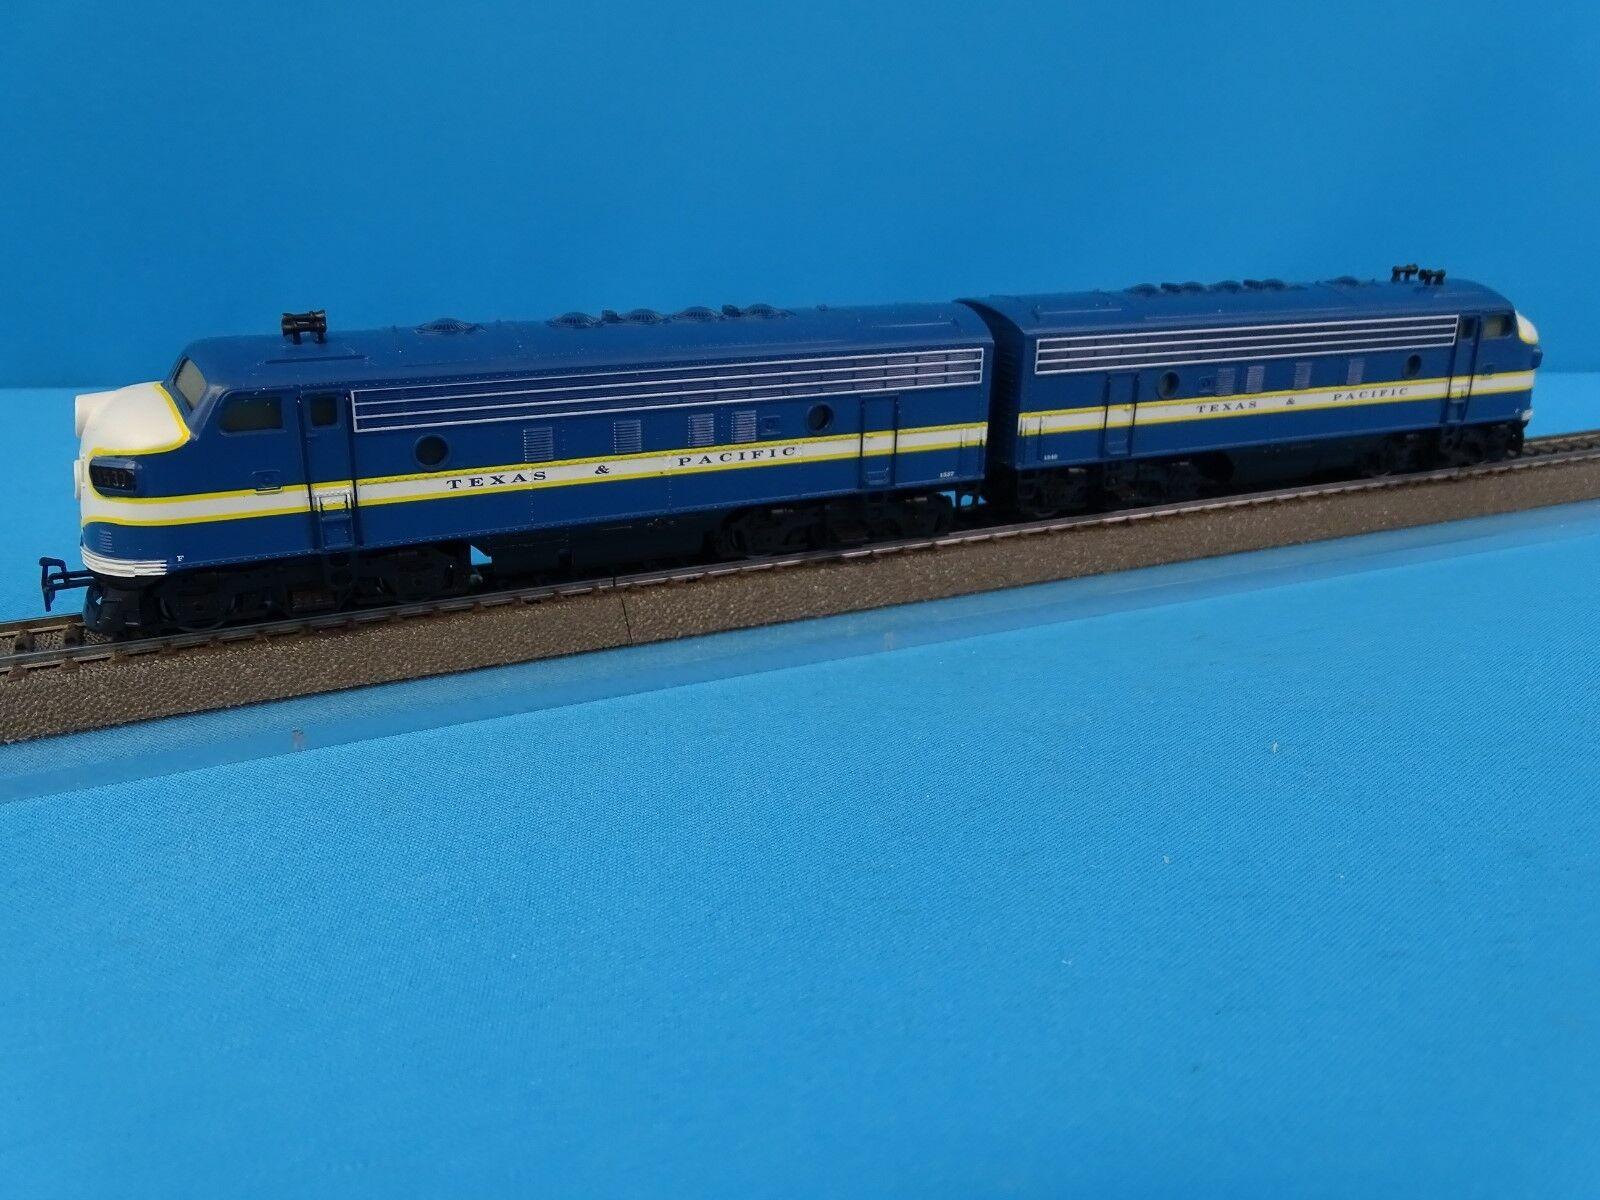 Marklin 3481 US F7 Diesellocomotive Double Traction TEXAS & PACIFIC Blue